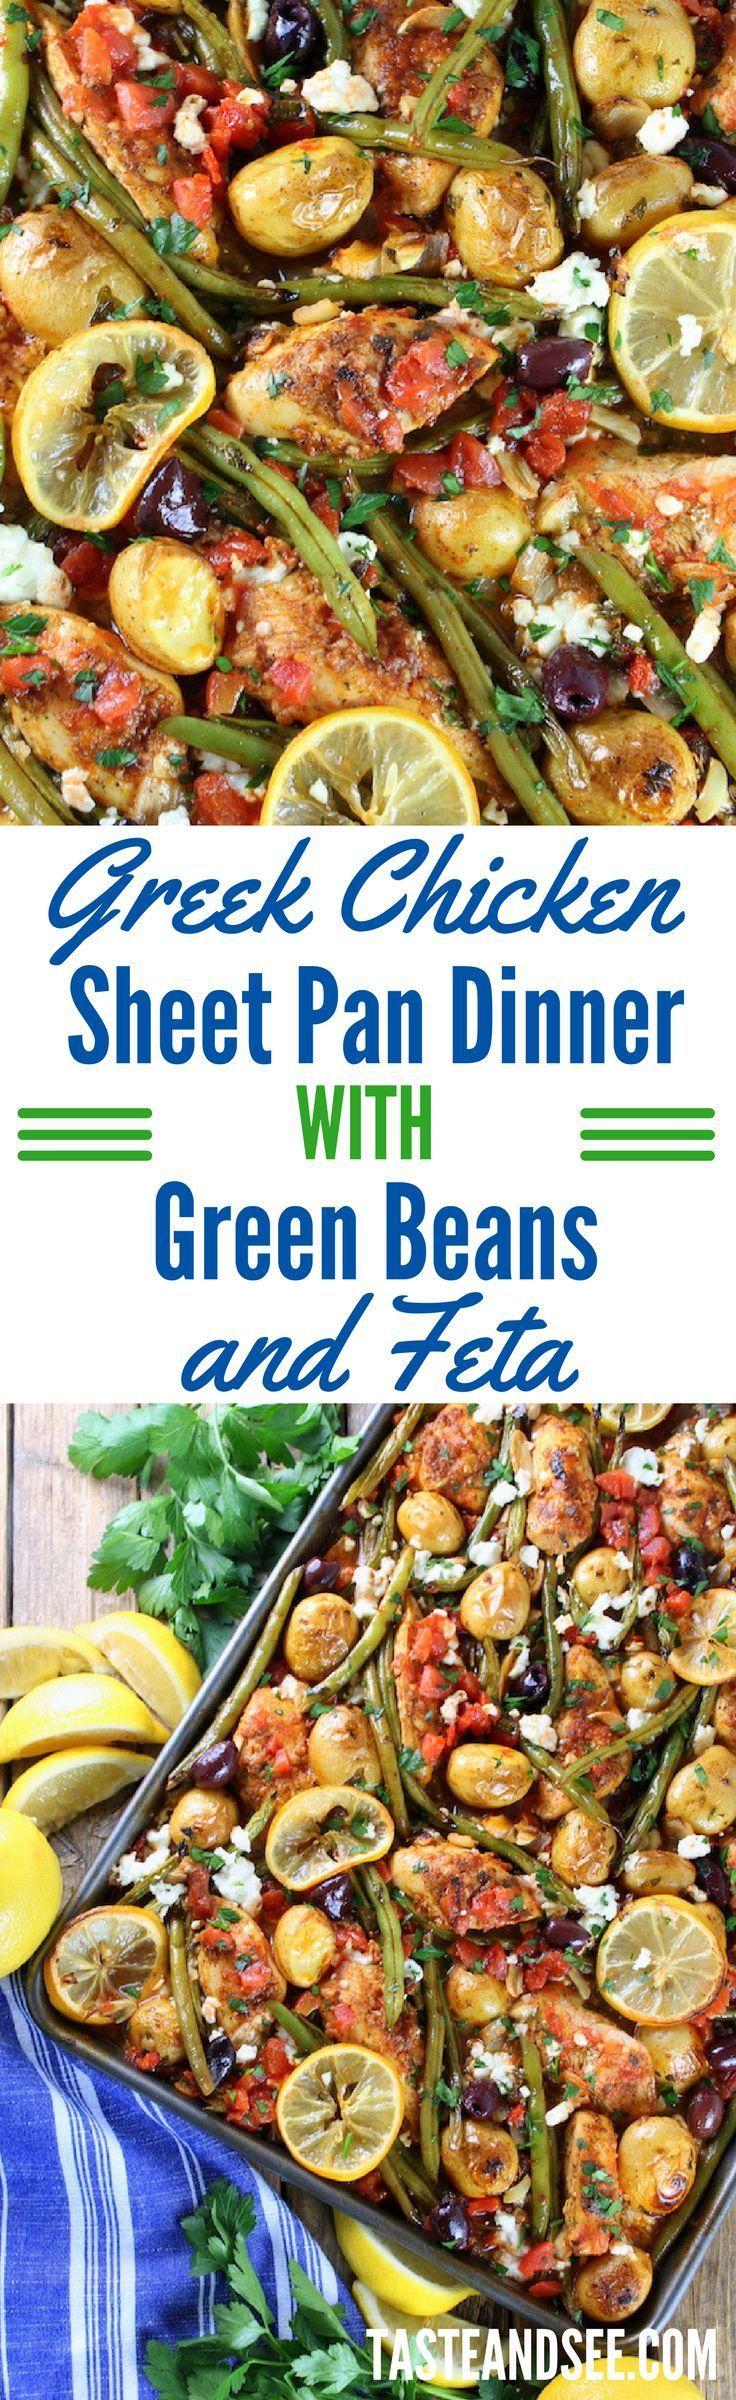 Greek Chicken Sheet Pan Dinner with Green Beans and Feta!  Mediterranean | Gluten-Free | Sheet-Pan | http://tasteandsee.com